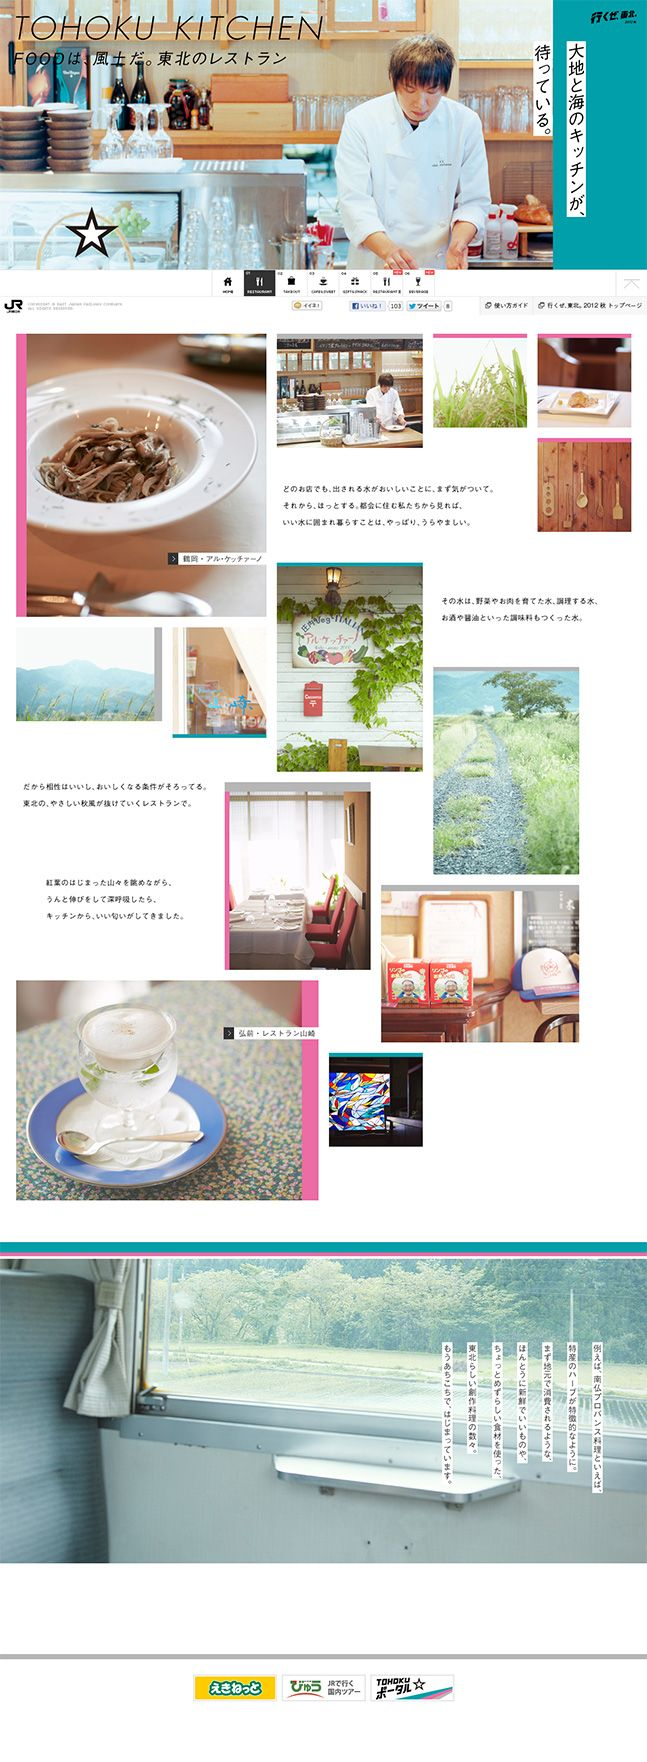 http://ikuze-tohoku.jp/kitchen/ | web design | Pinterest | Design ...